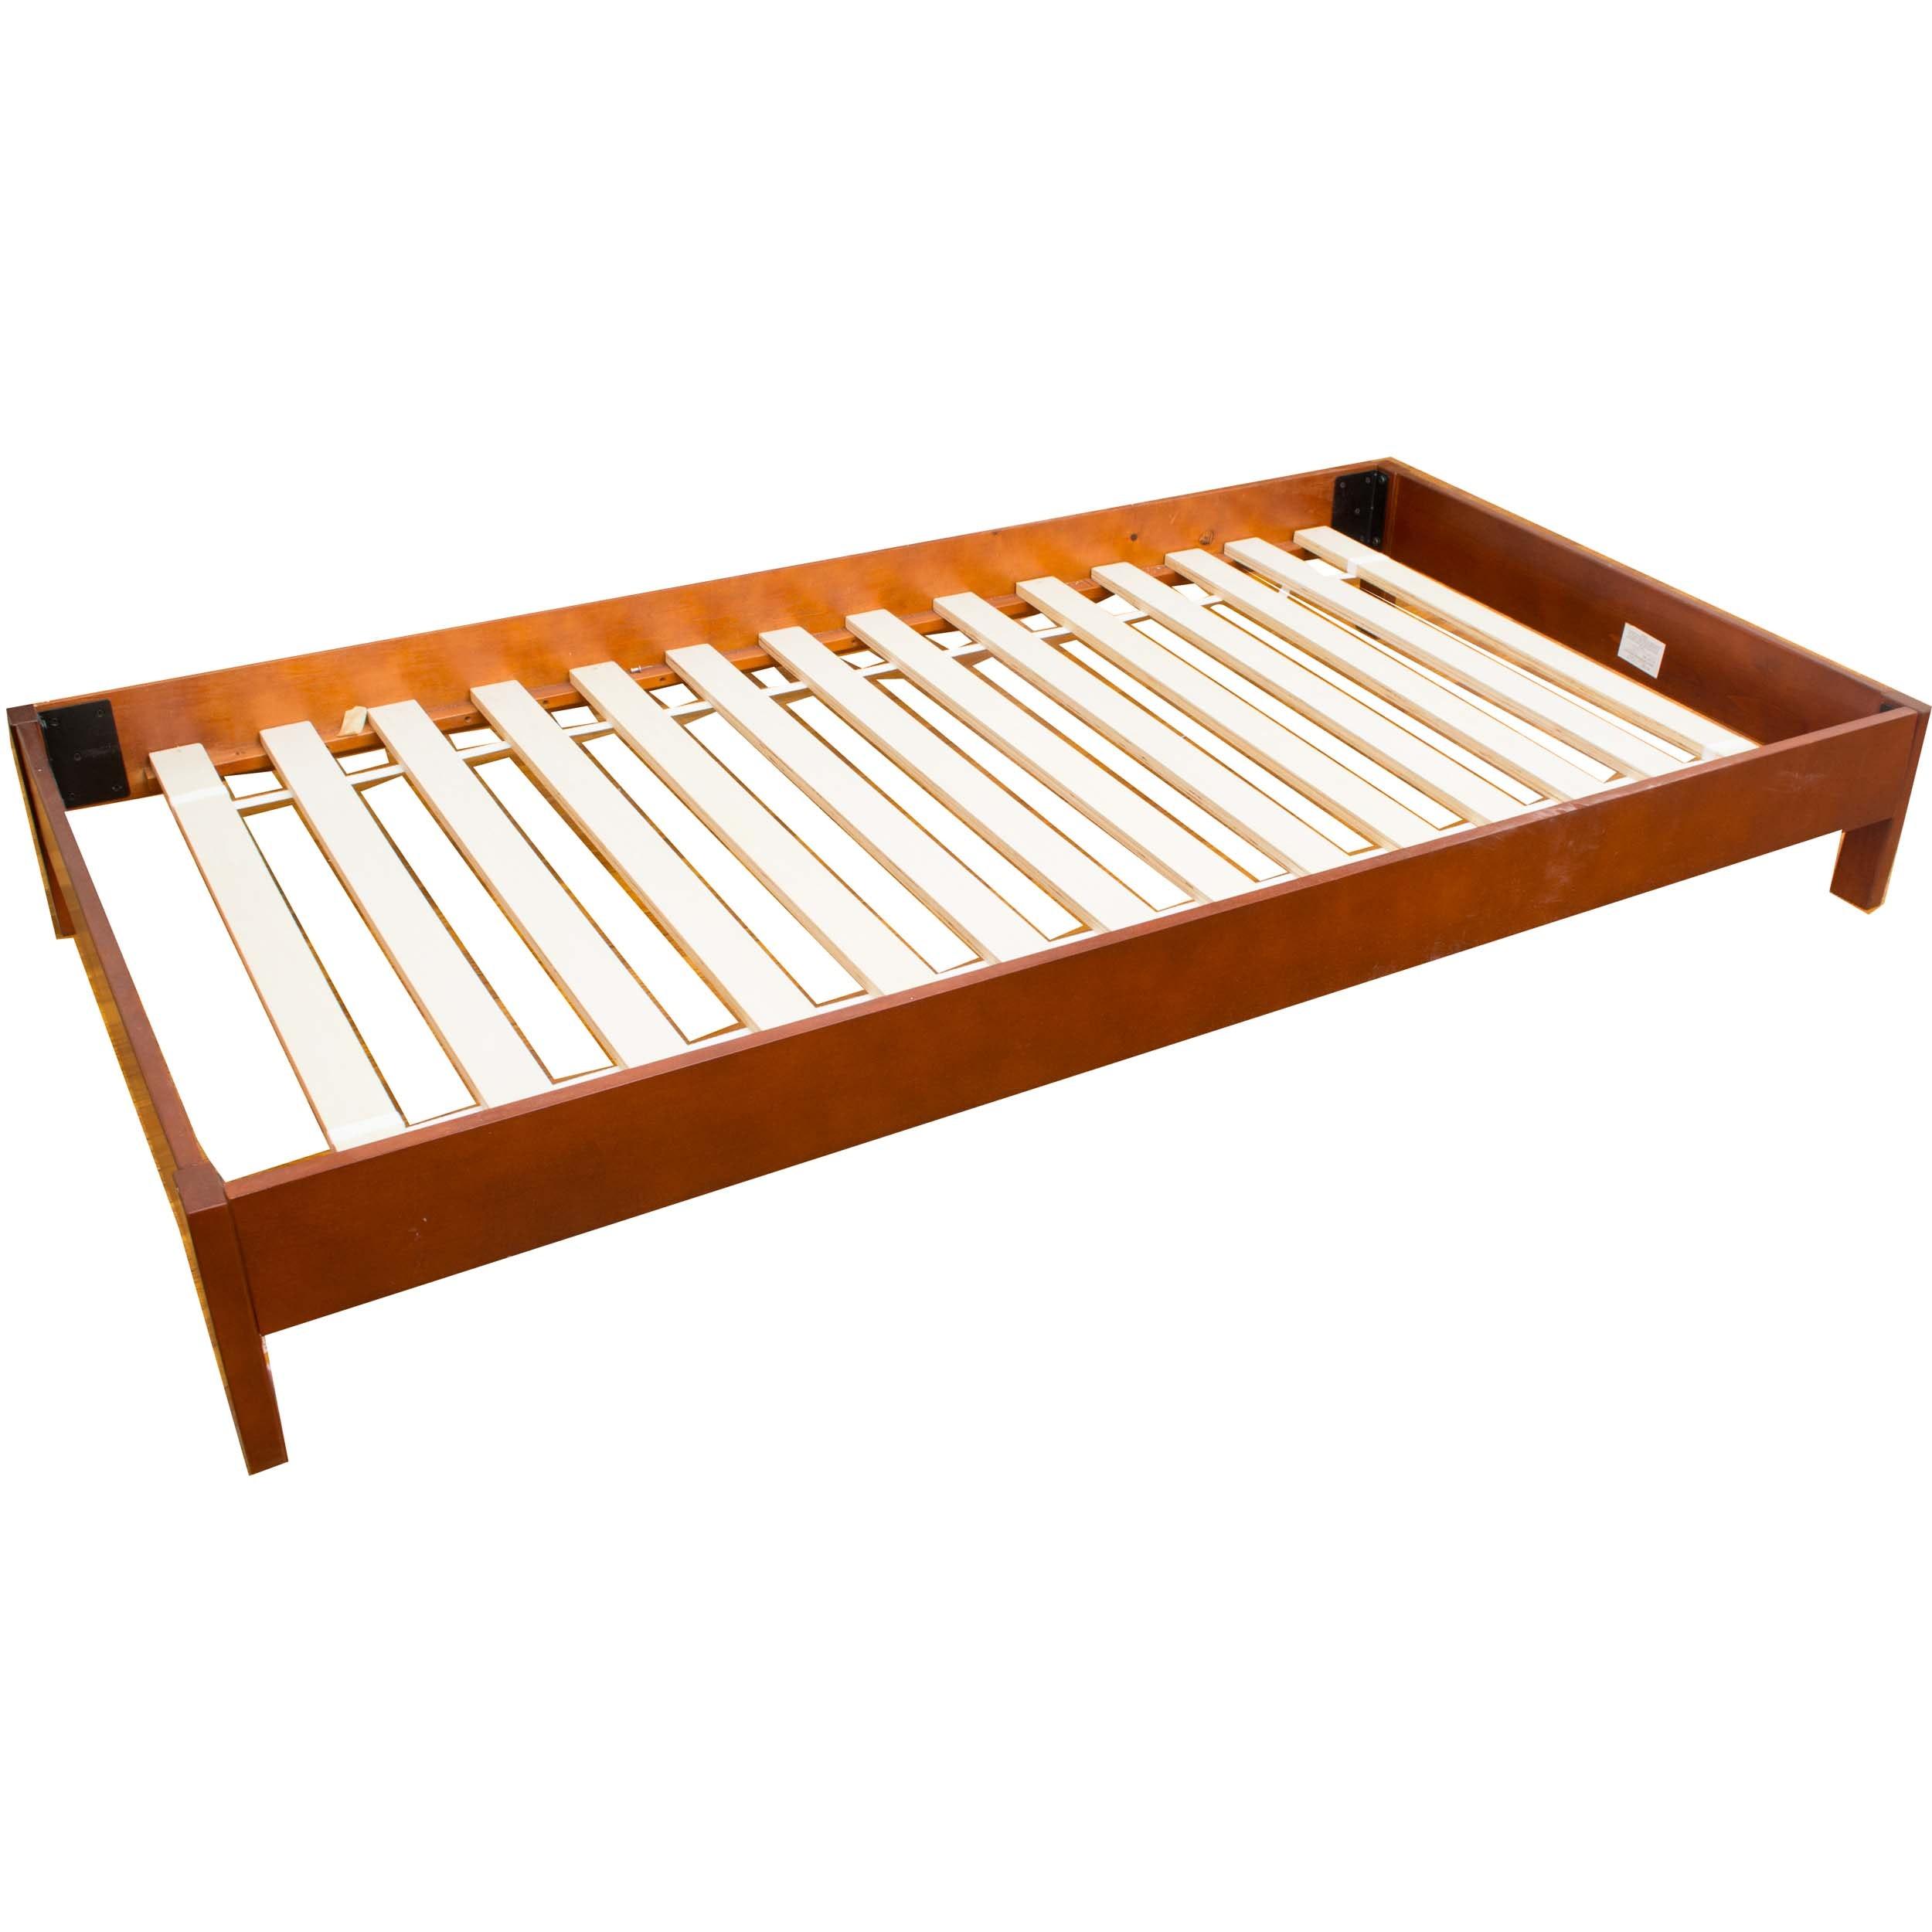 Platform Twin Bed with Mahogany Finish